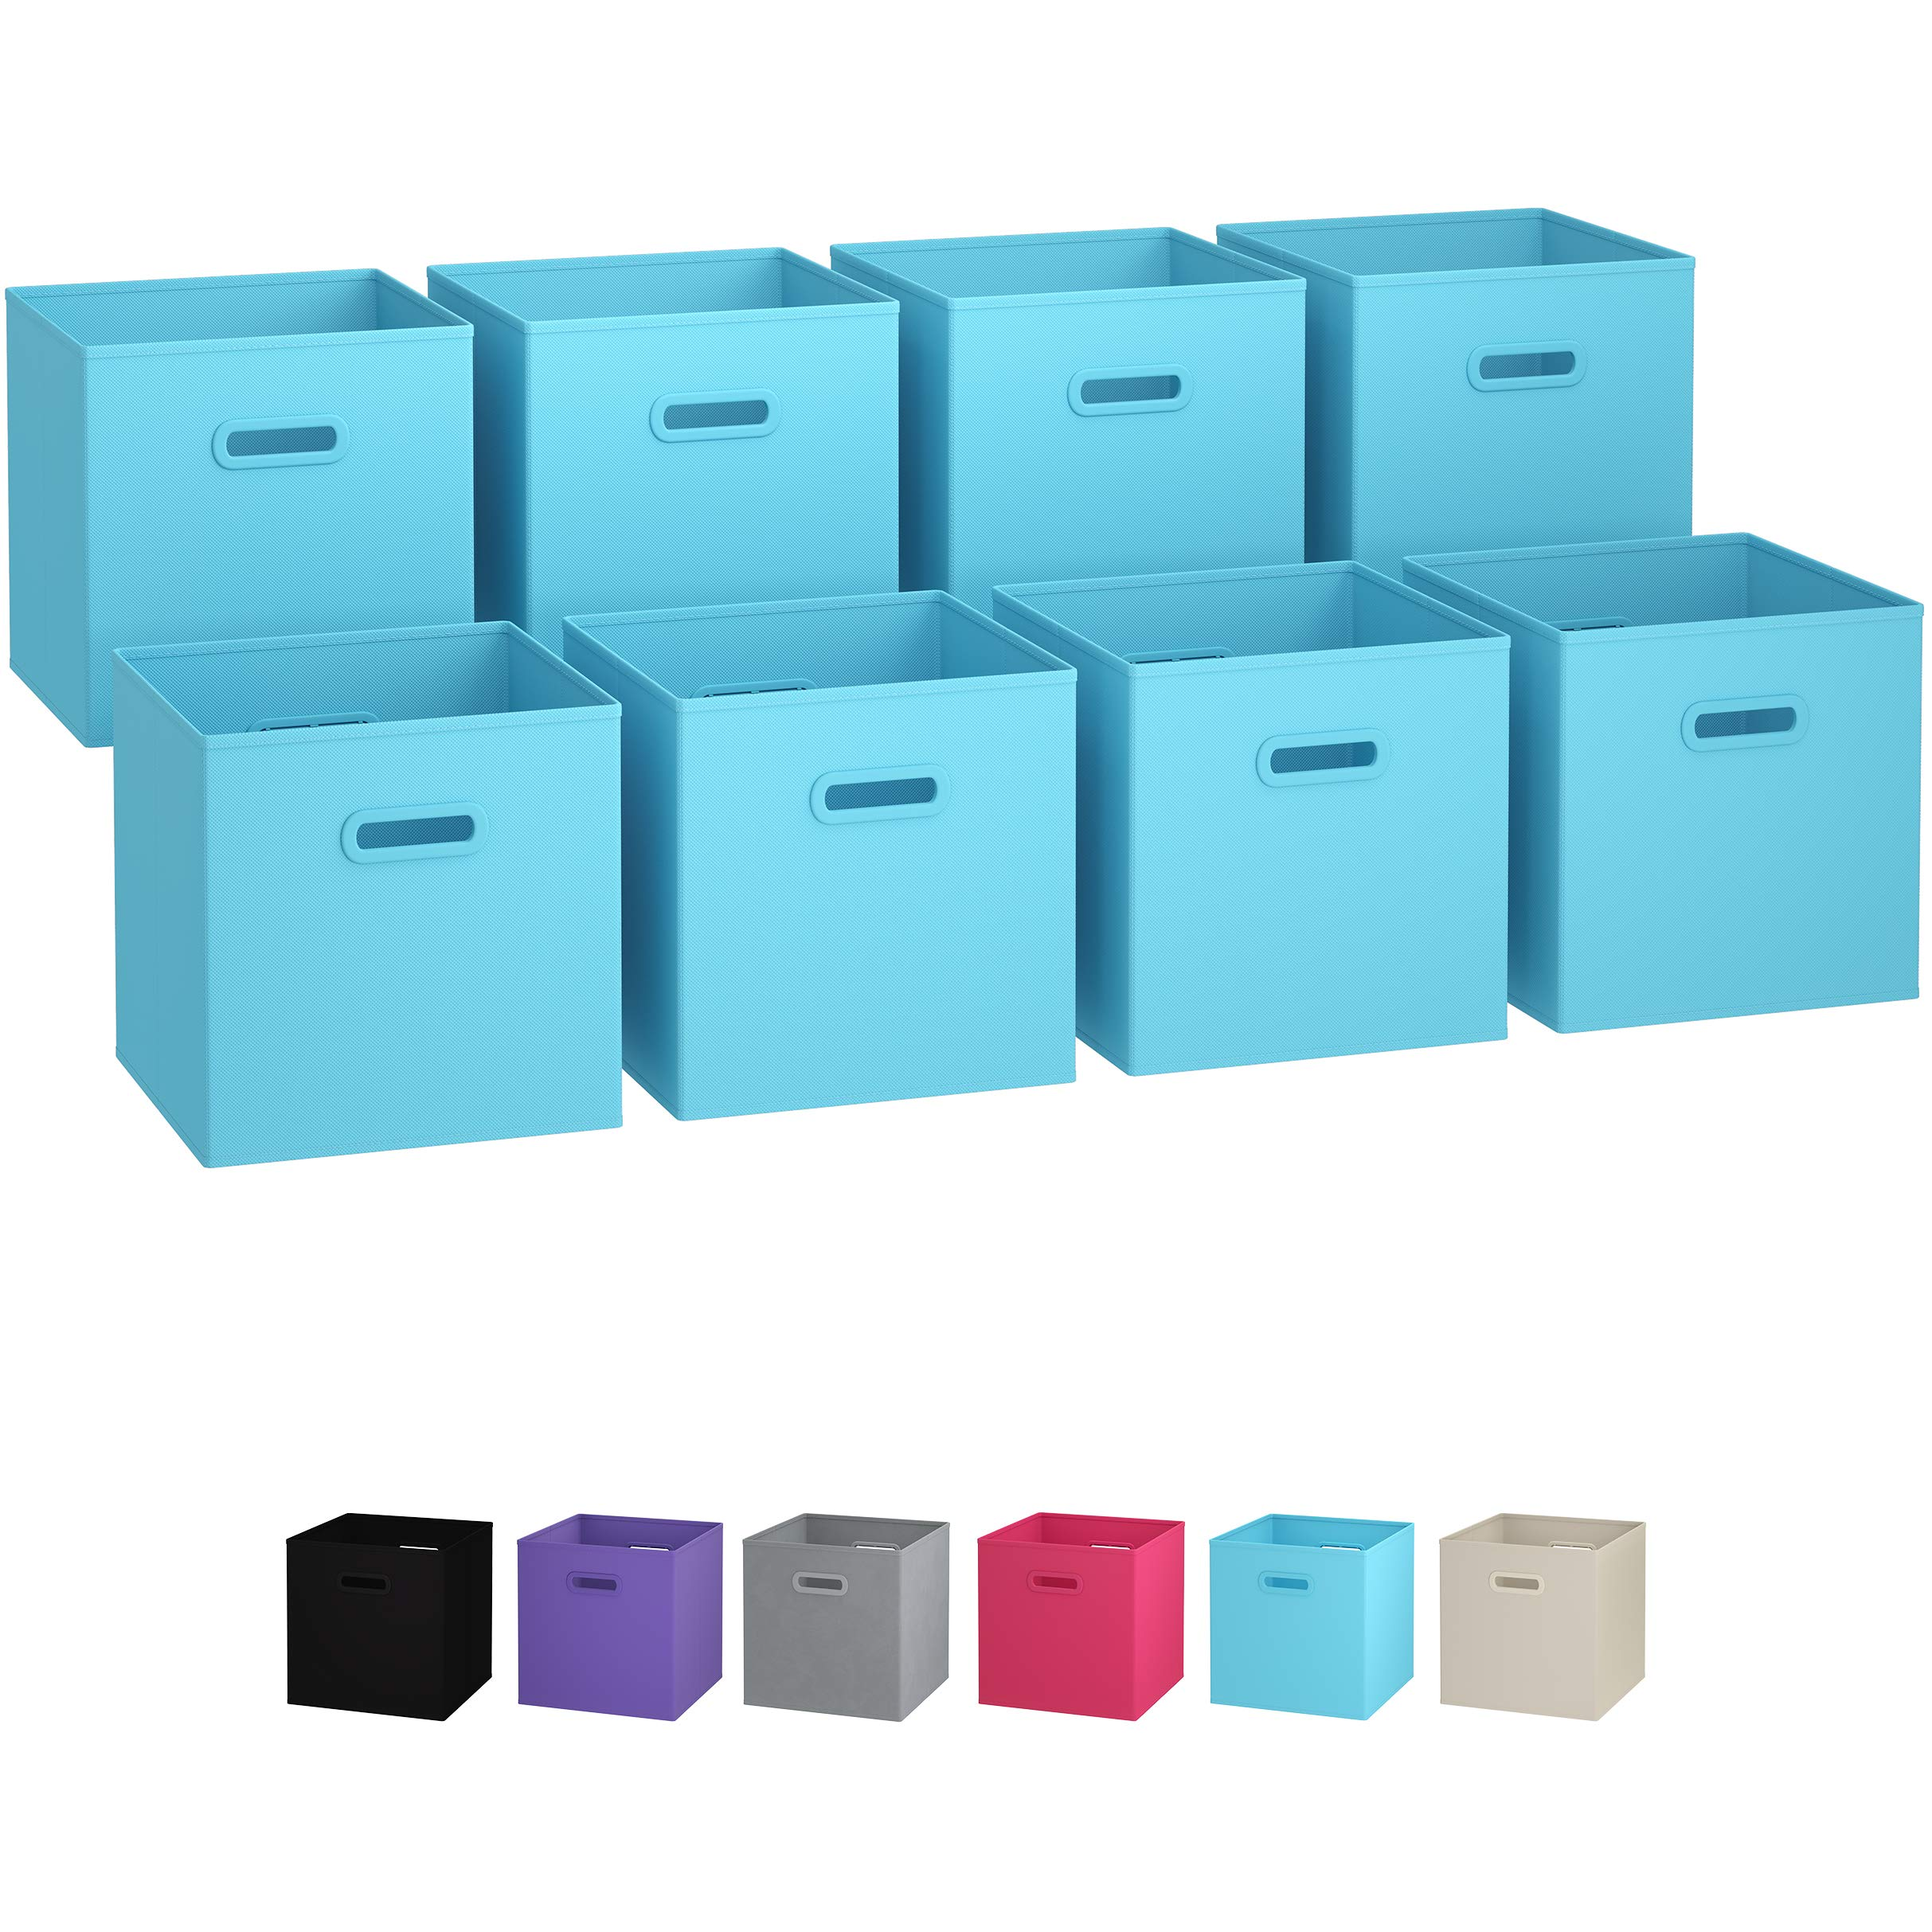 Royexe - Storage Cubes - (Set of 8) Storage Baskets | Features Dual Handles | Cube Storage Bins | Foldable Fabric Closet Shelf Organizer | Drawer Organizers and Storage (Blue)